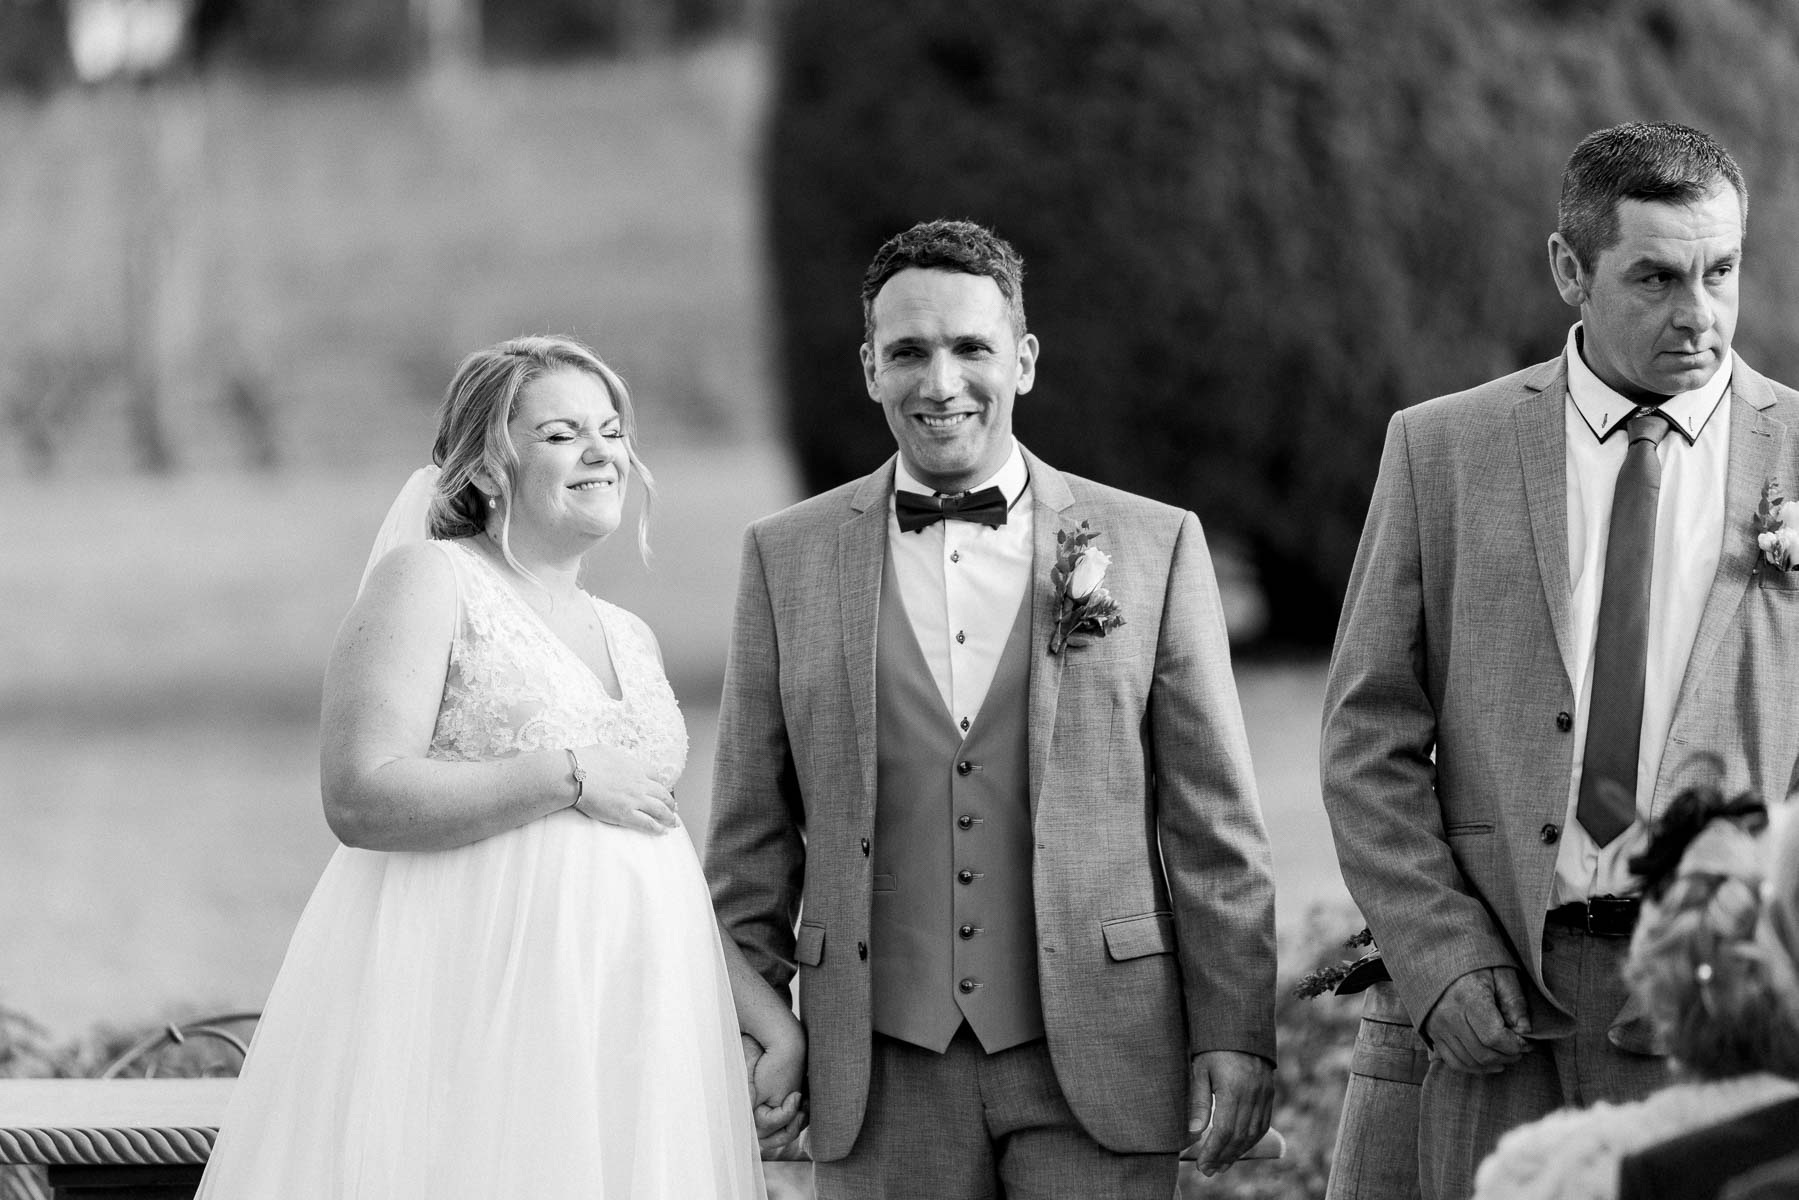 lindenderry-wedding-heart+soul-weddings-amy-alain-03278.jpg